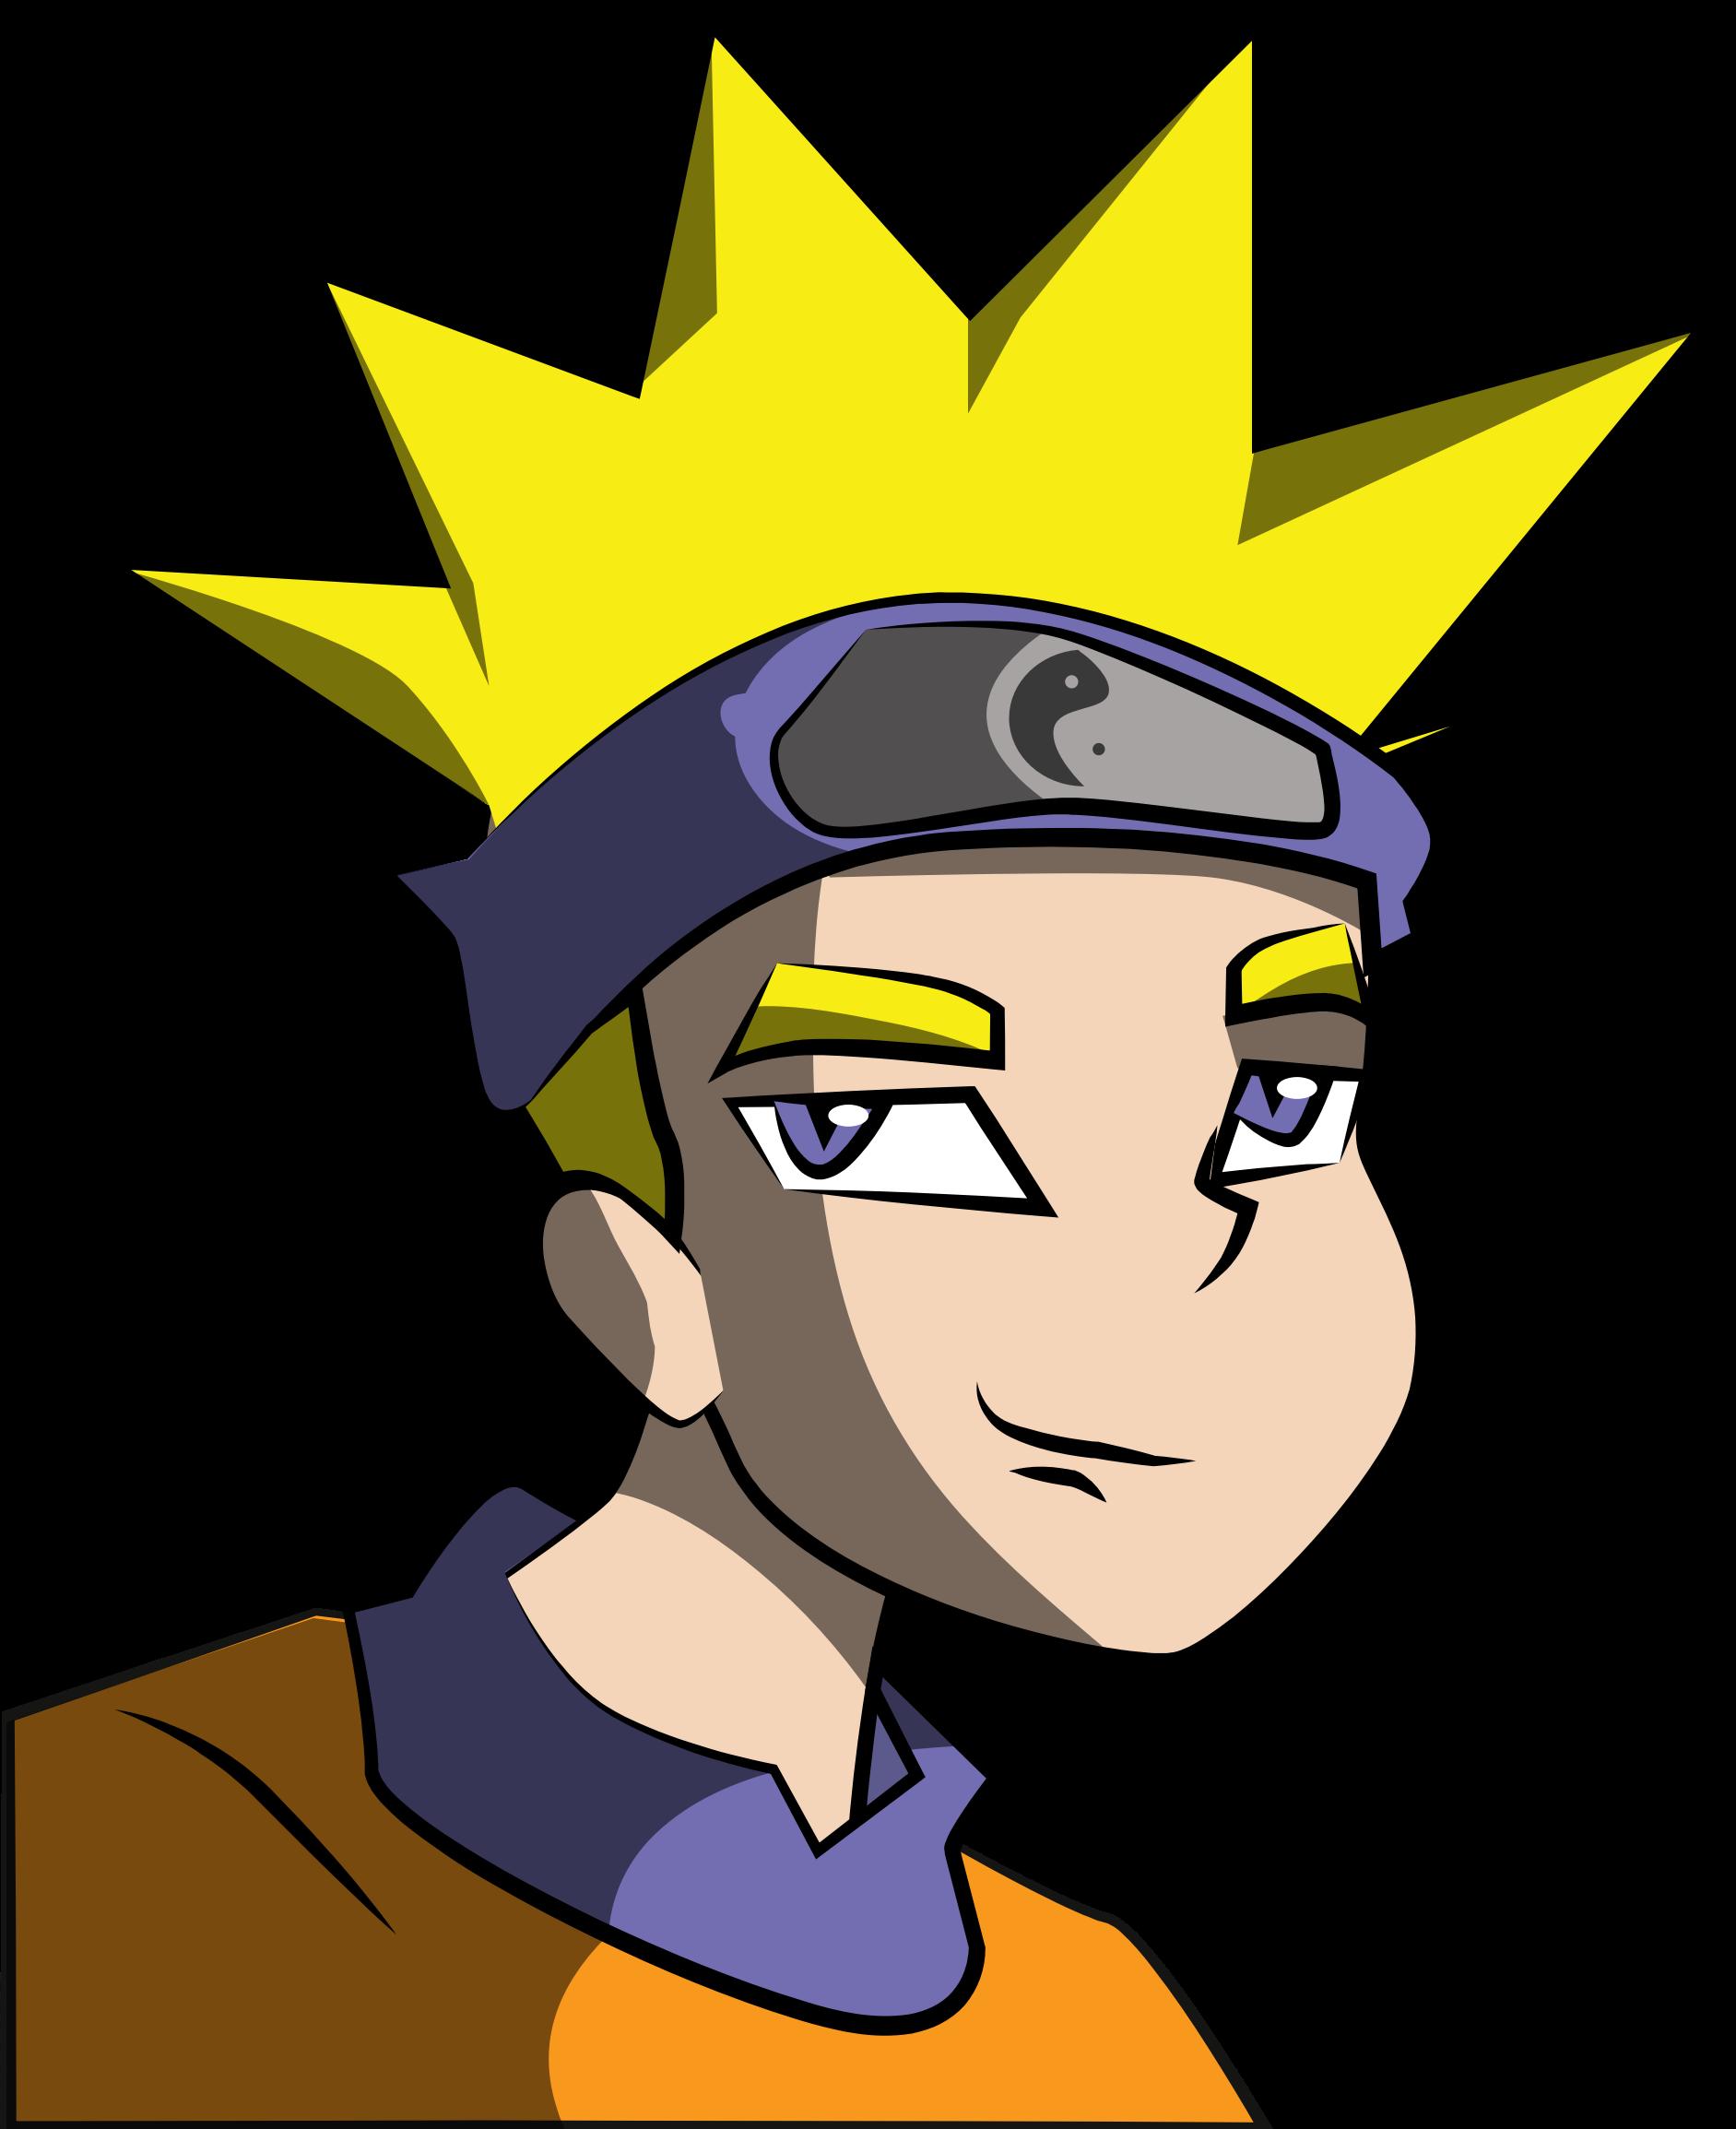 Boy big image png. Anime clipart anime character